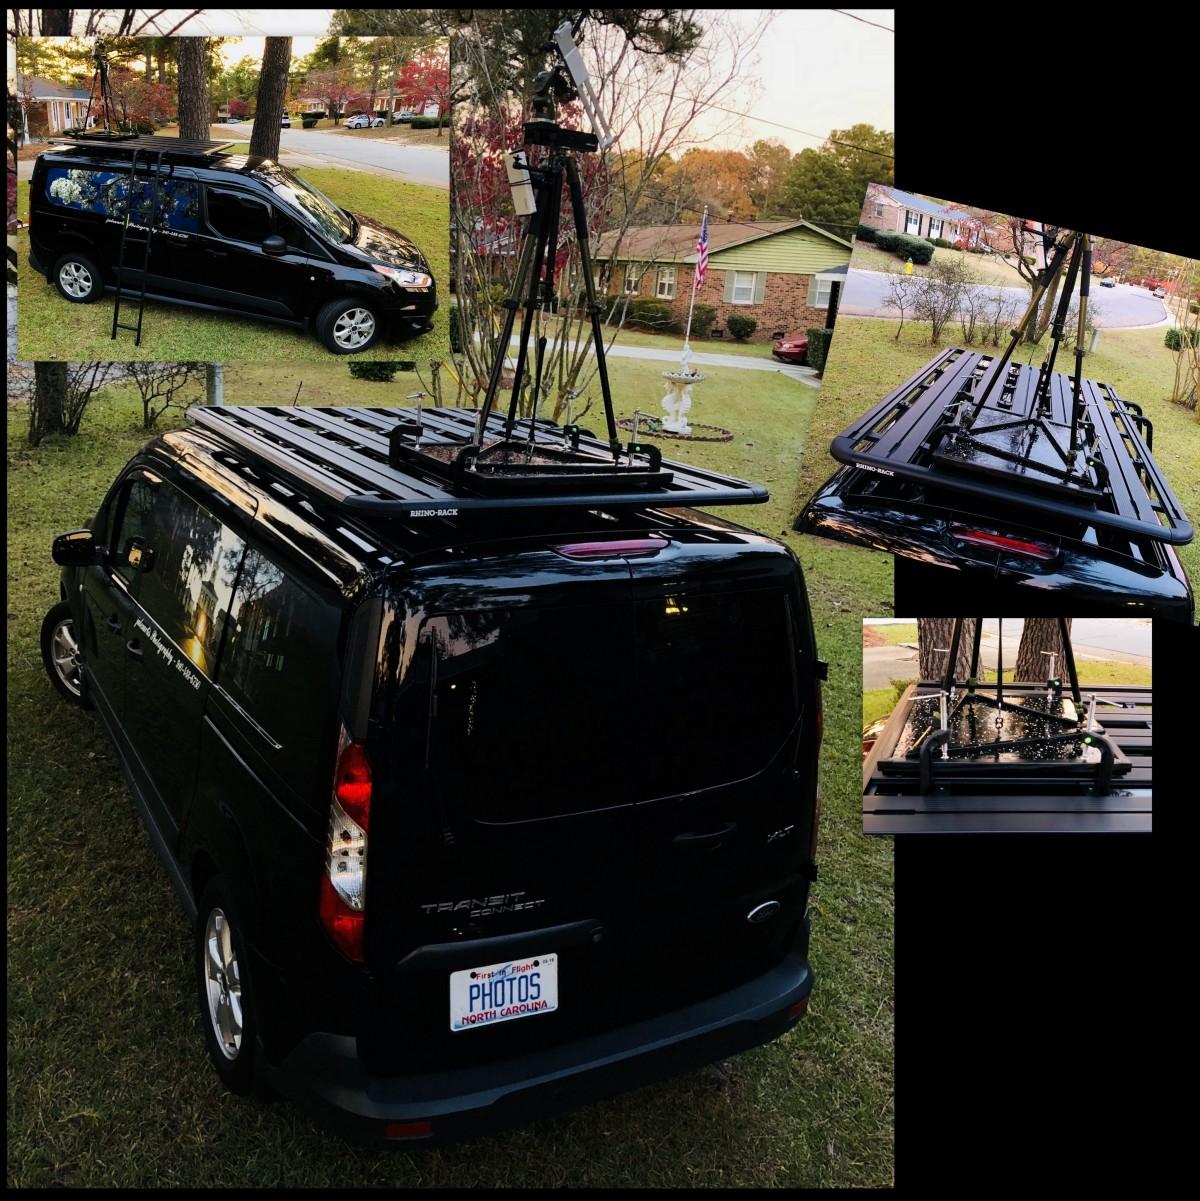 DIY [#36] ~ Tripod Holder for Rhino Rack Pioneer Platform–Clamped & Loaded,11/23